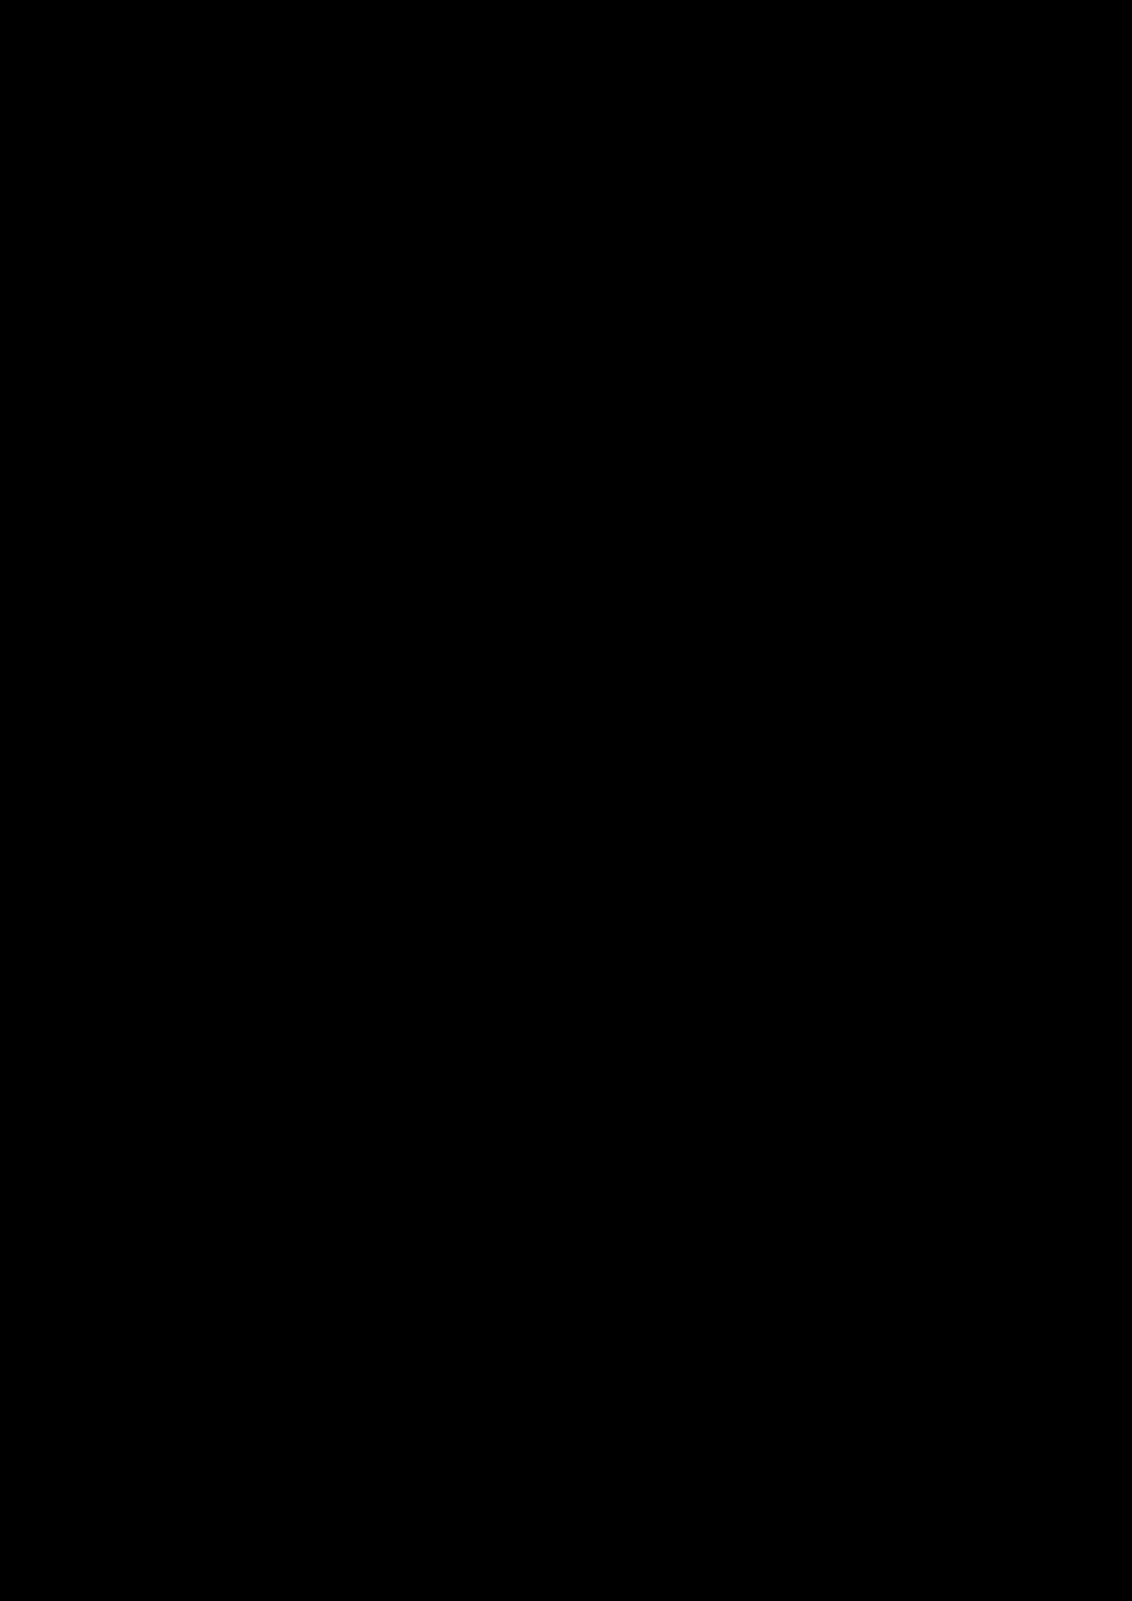 Ispoved Pervogo Boga slide, Image 41